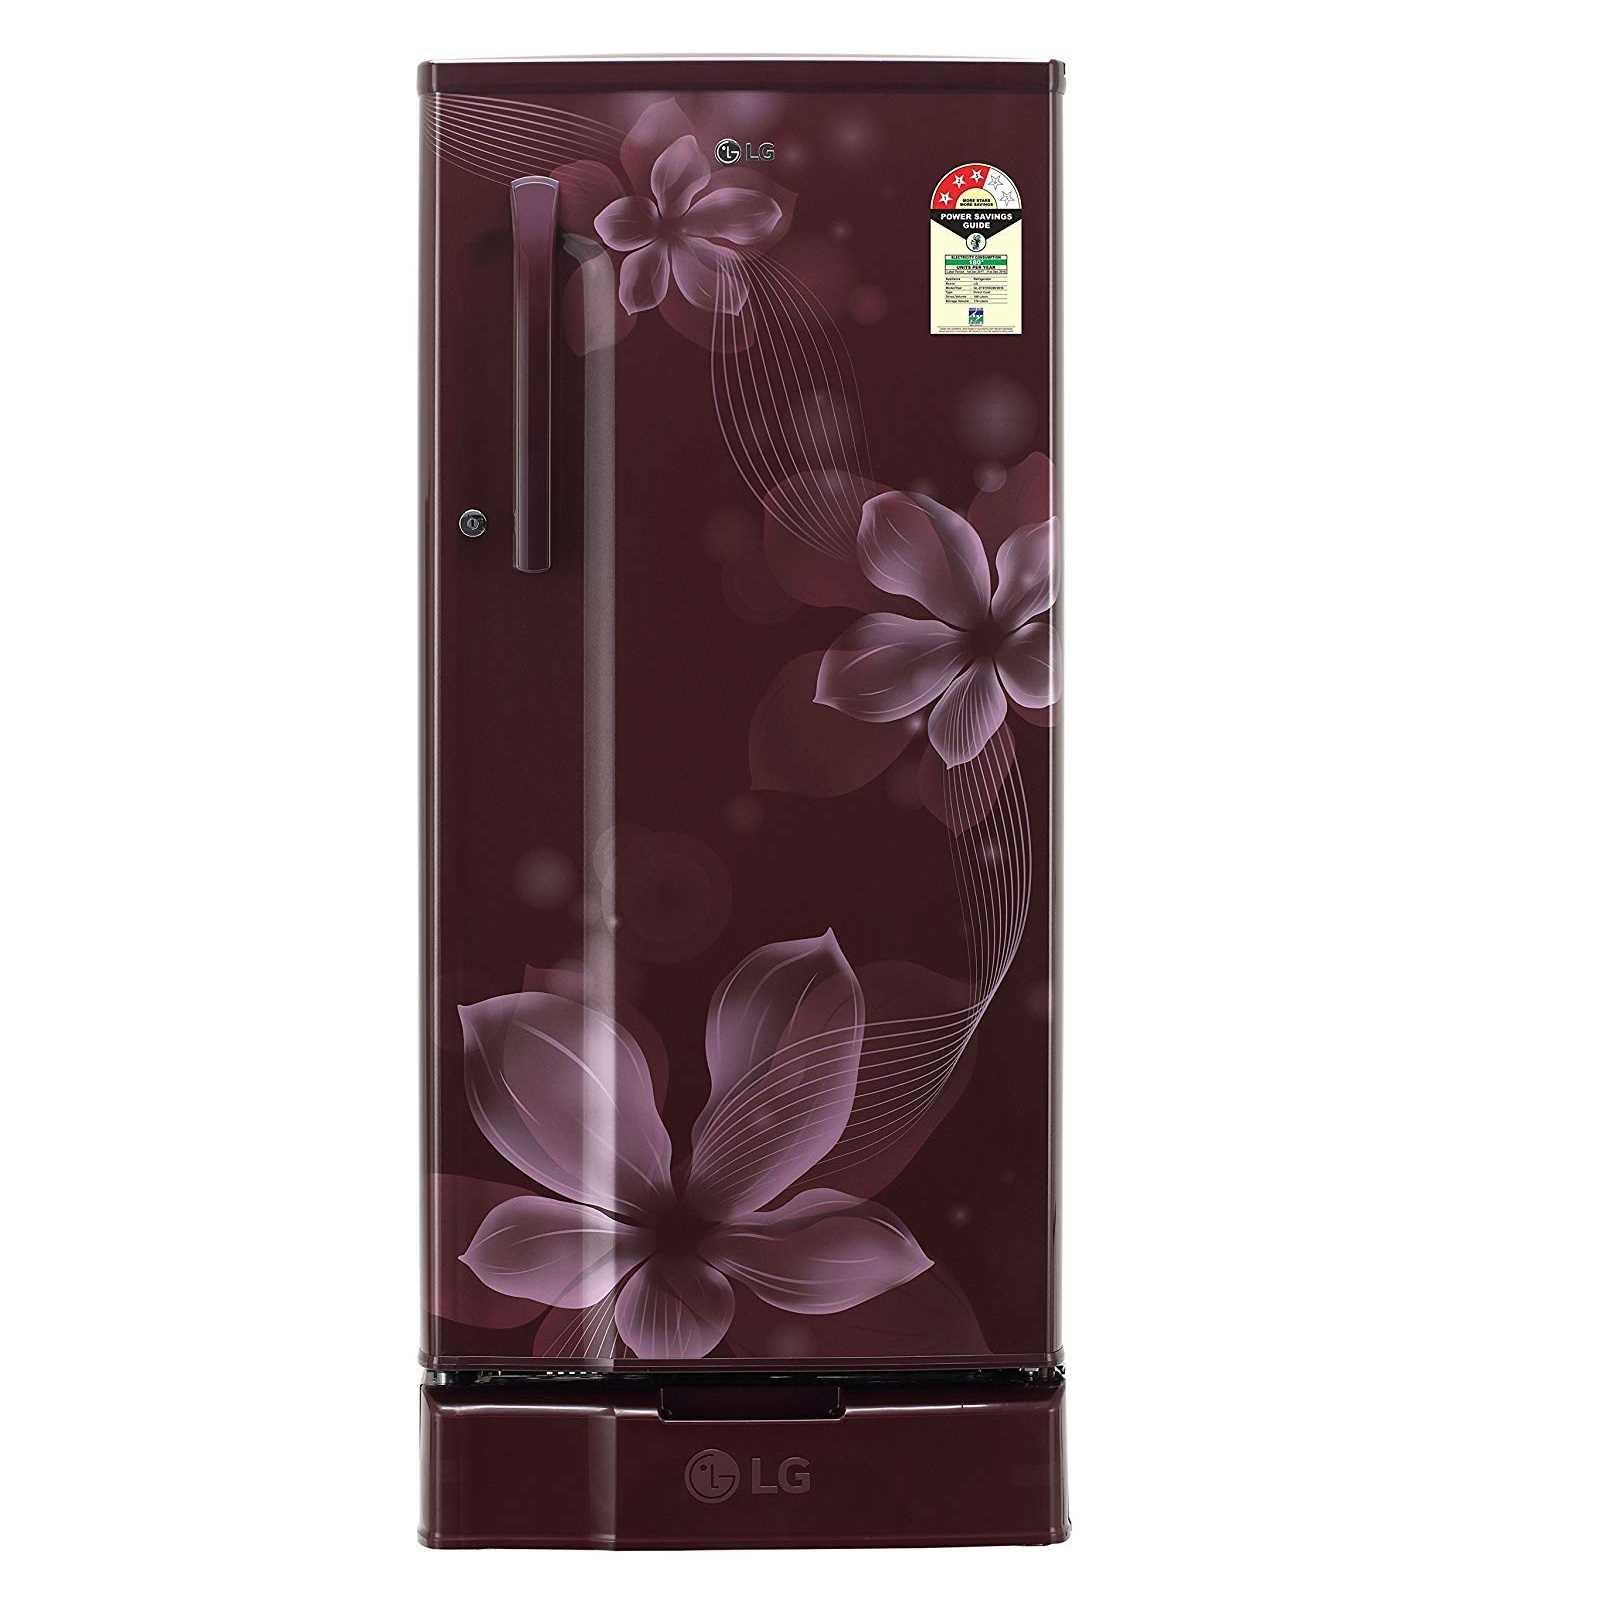 LG GL D191KSOW 188 Liter Direct Cool Single Door Refrigerator